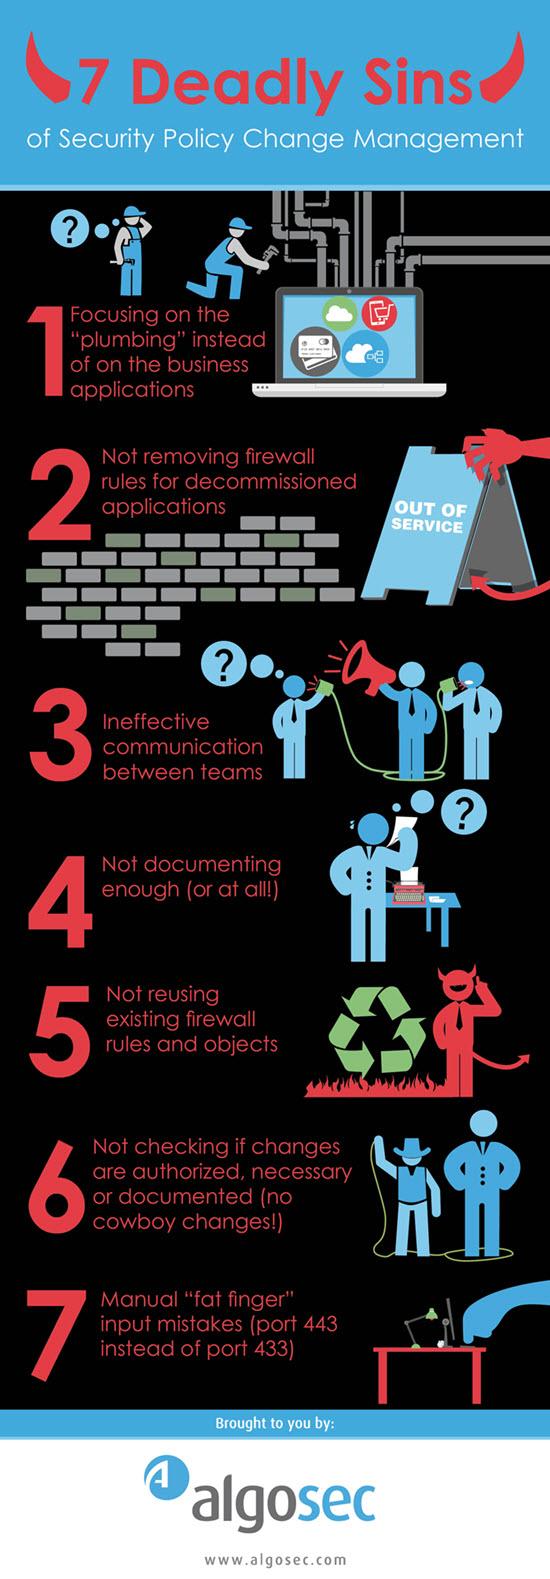 7 Deadly Sins AlgoSec infoGraphic